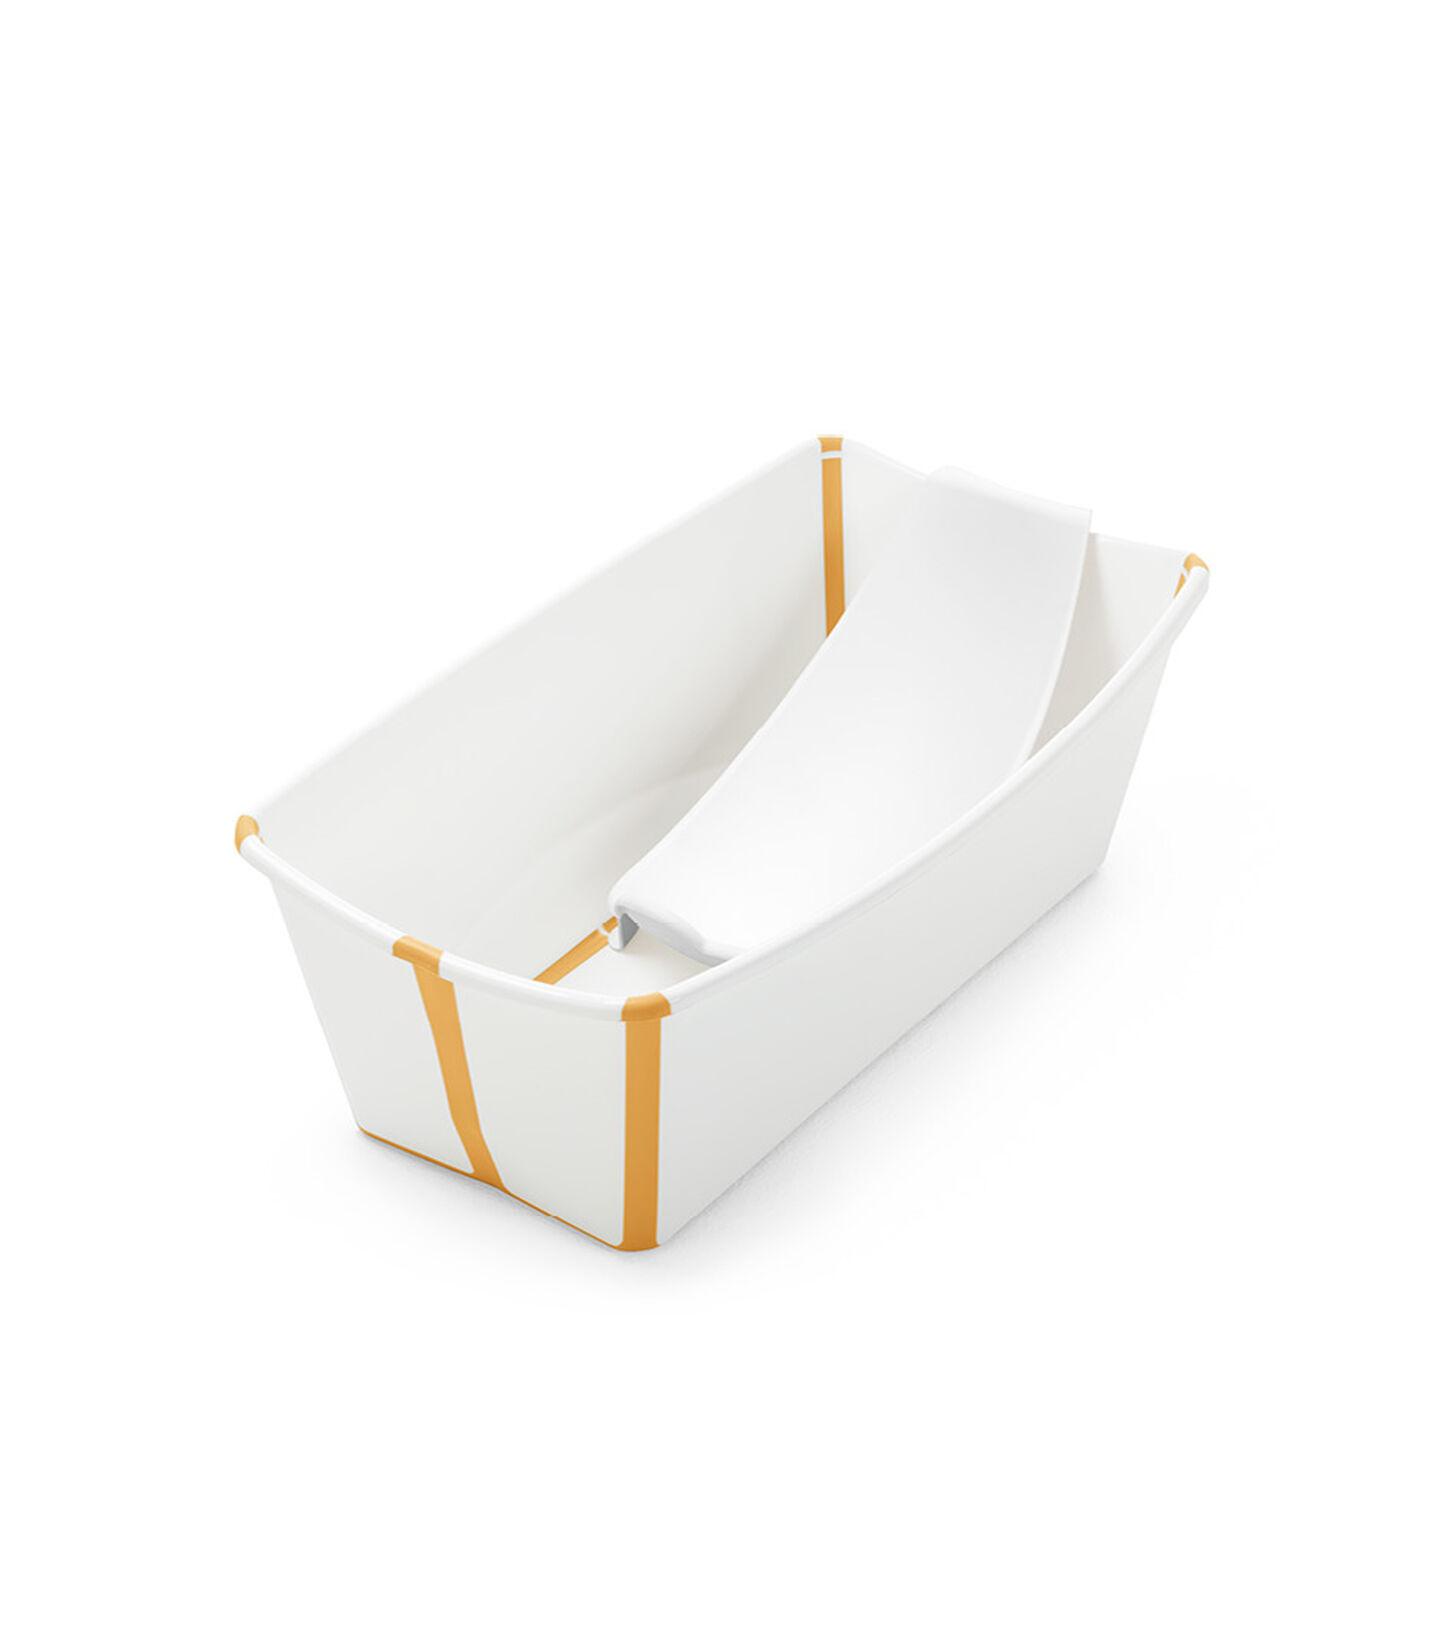 Stokke® Flexi Bath® Bundle White Yellow, Bianco Giallo, mainview view 1